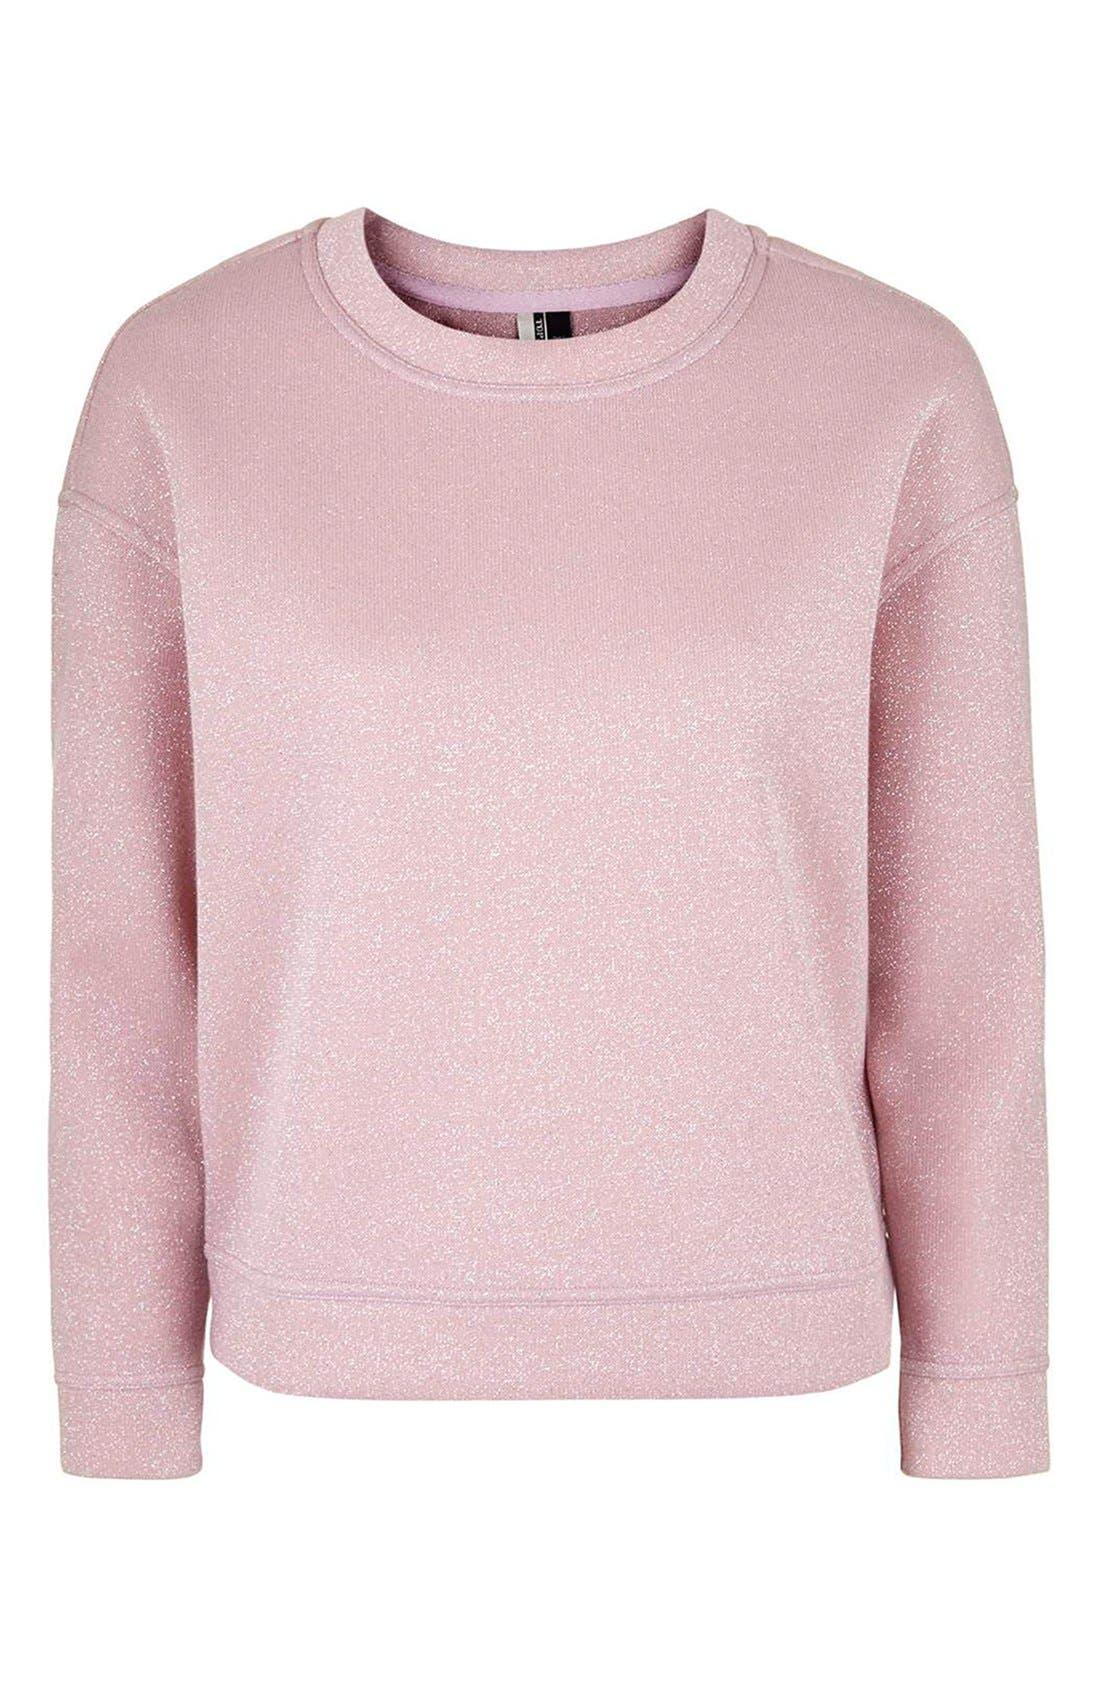 TOPSHOP,                             Glitter Sweatshirt,                             Alternate thumbnail 5, color,                             650